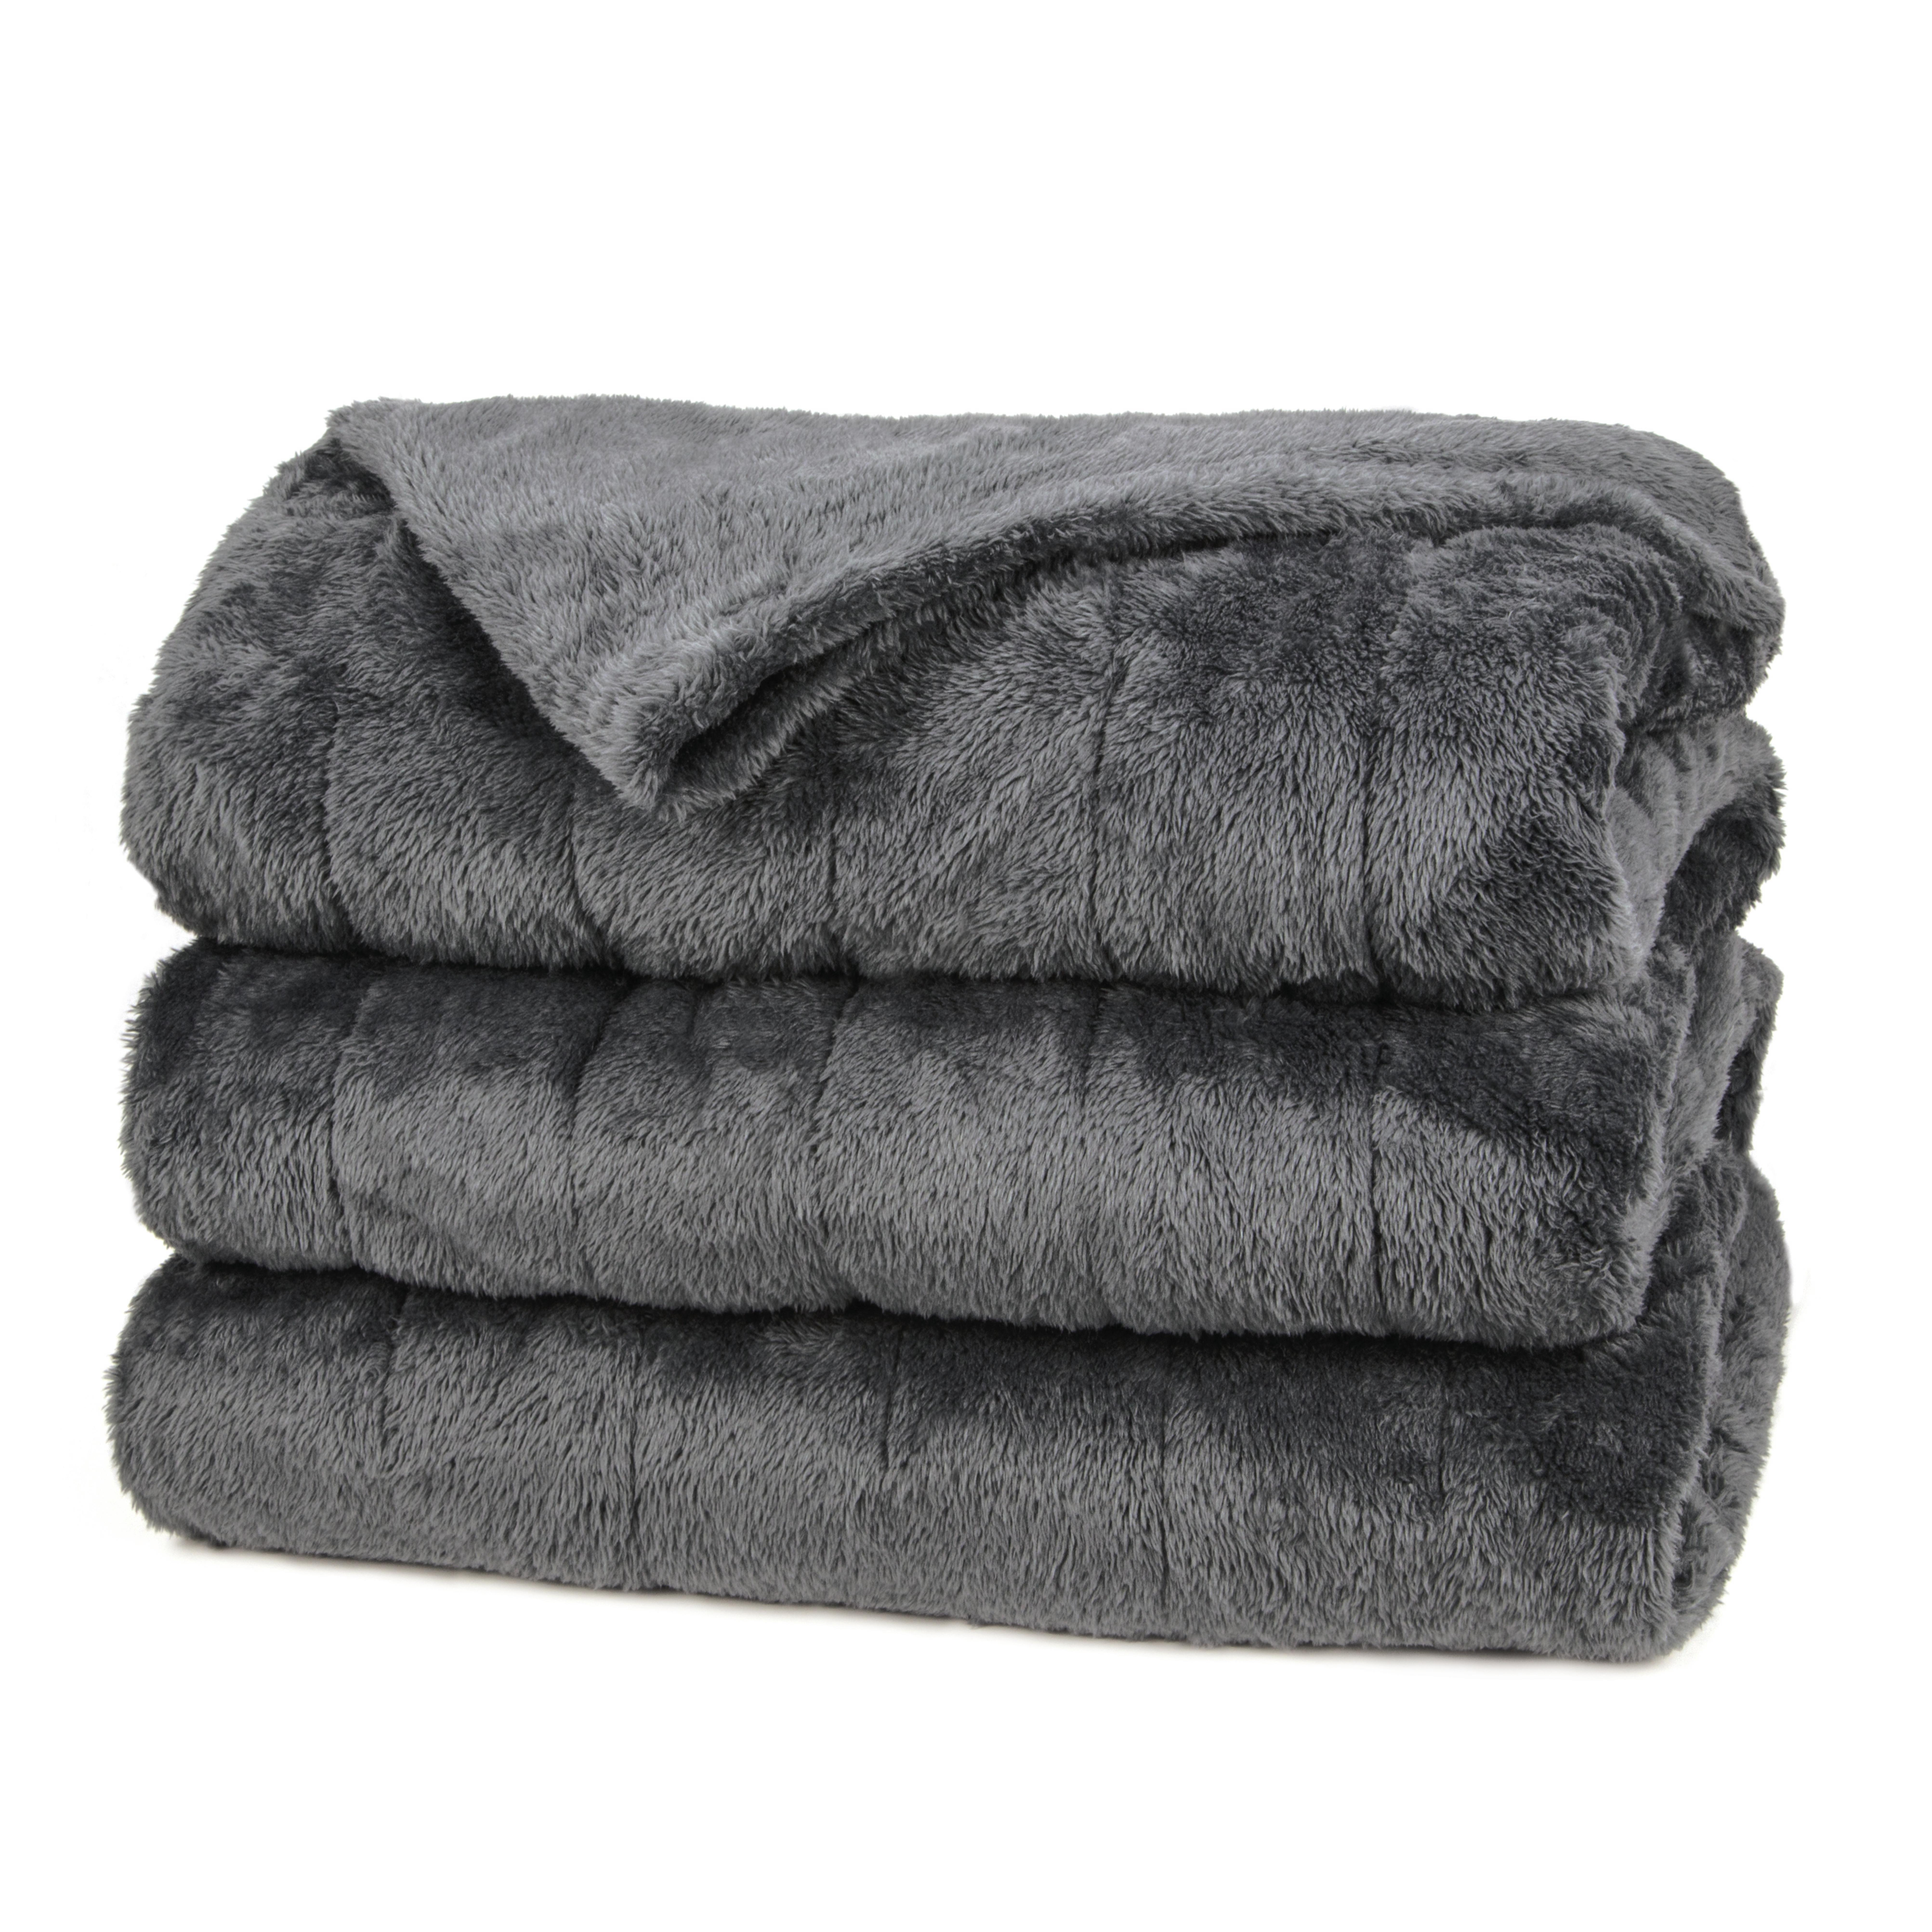 Sunbeam Heated Electric Microplush Blanket with 10 heat settings, Queen, Slate